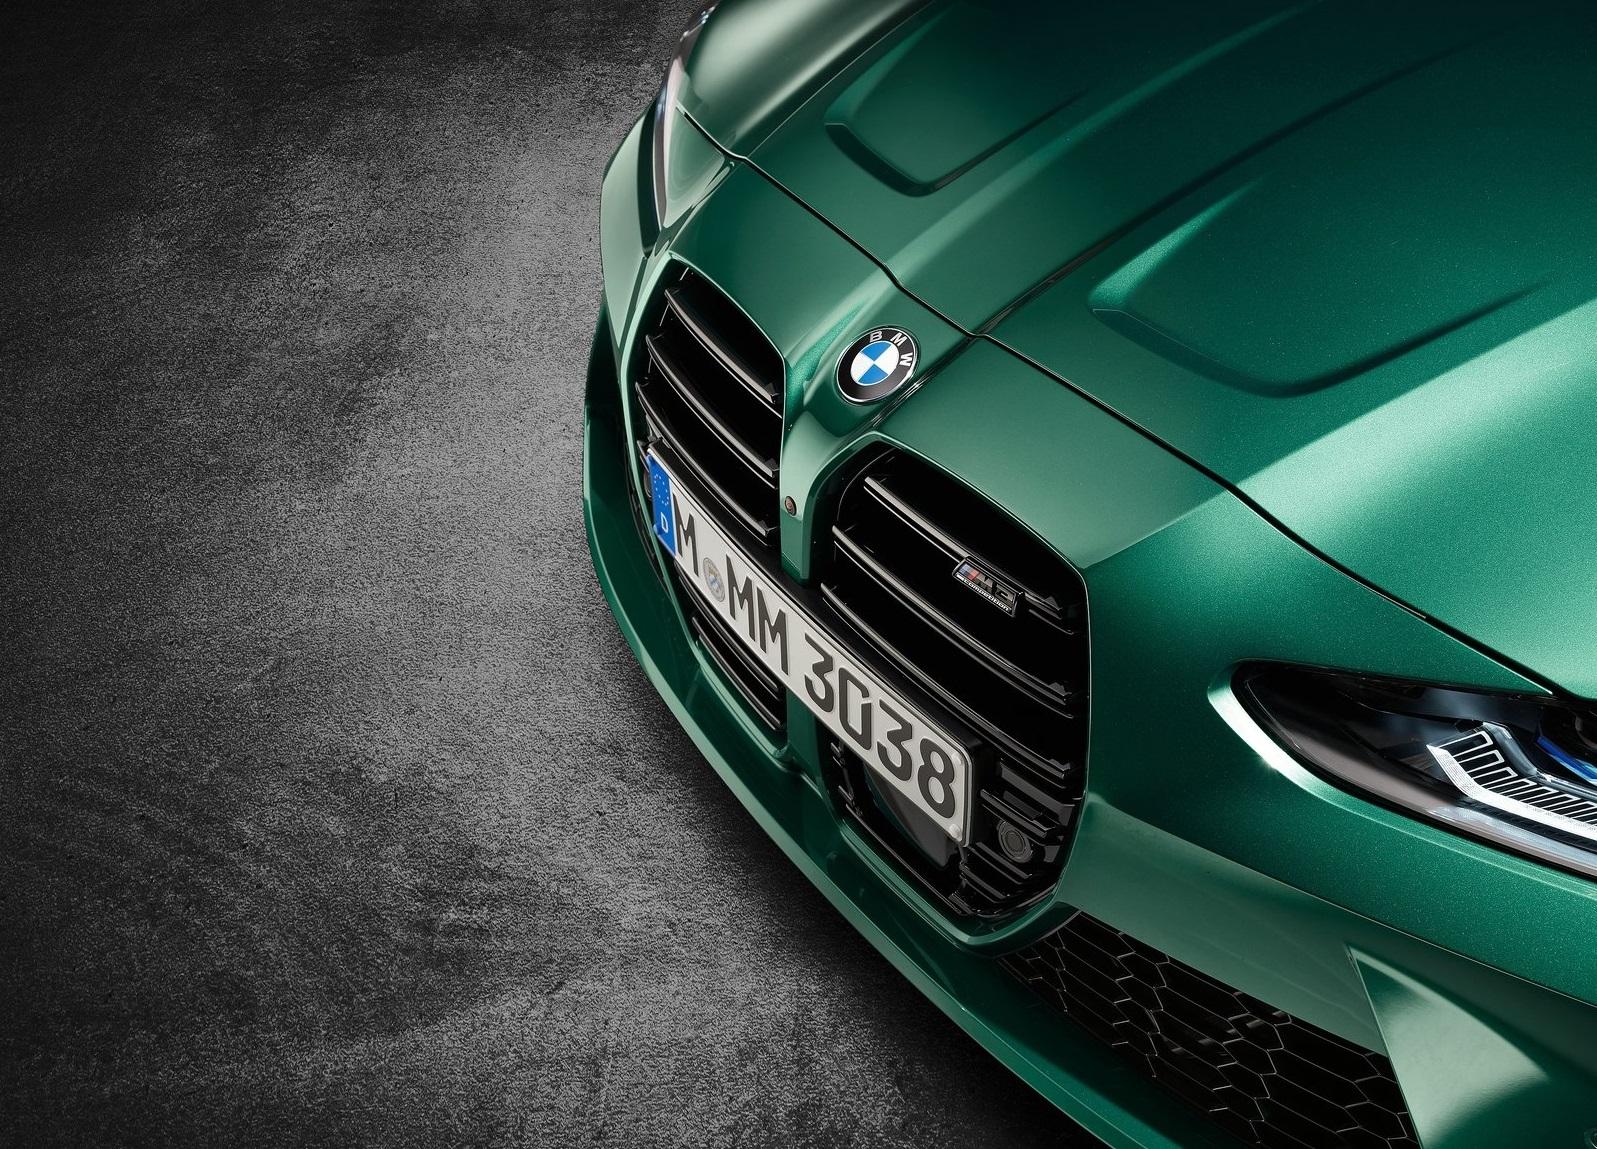 H BMW δεν θα σταματήσει να εξελίσσει τους θερμικούς κινητήρες της